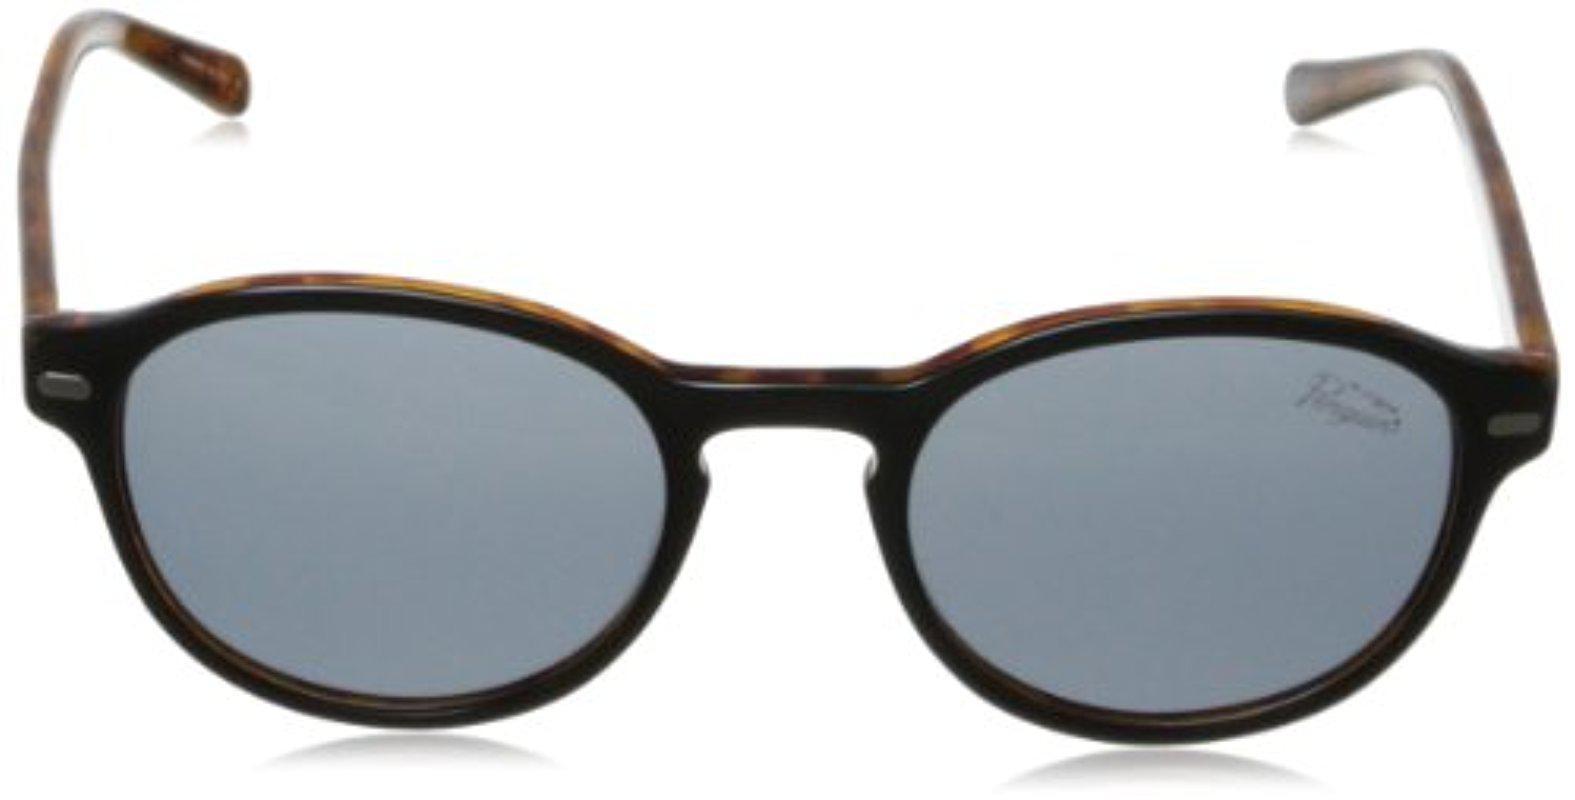 bf54ff88ef1 Lyst - Original Penguin The Redding Polarized Round Sunglasses in ...